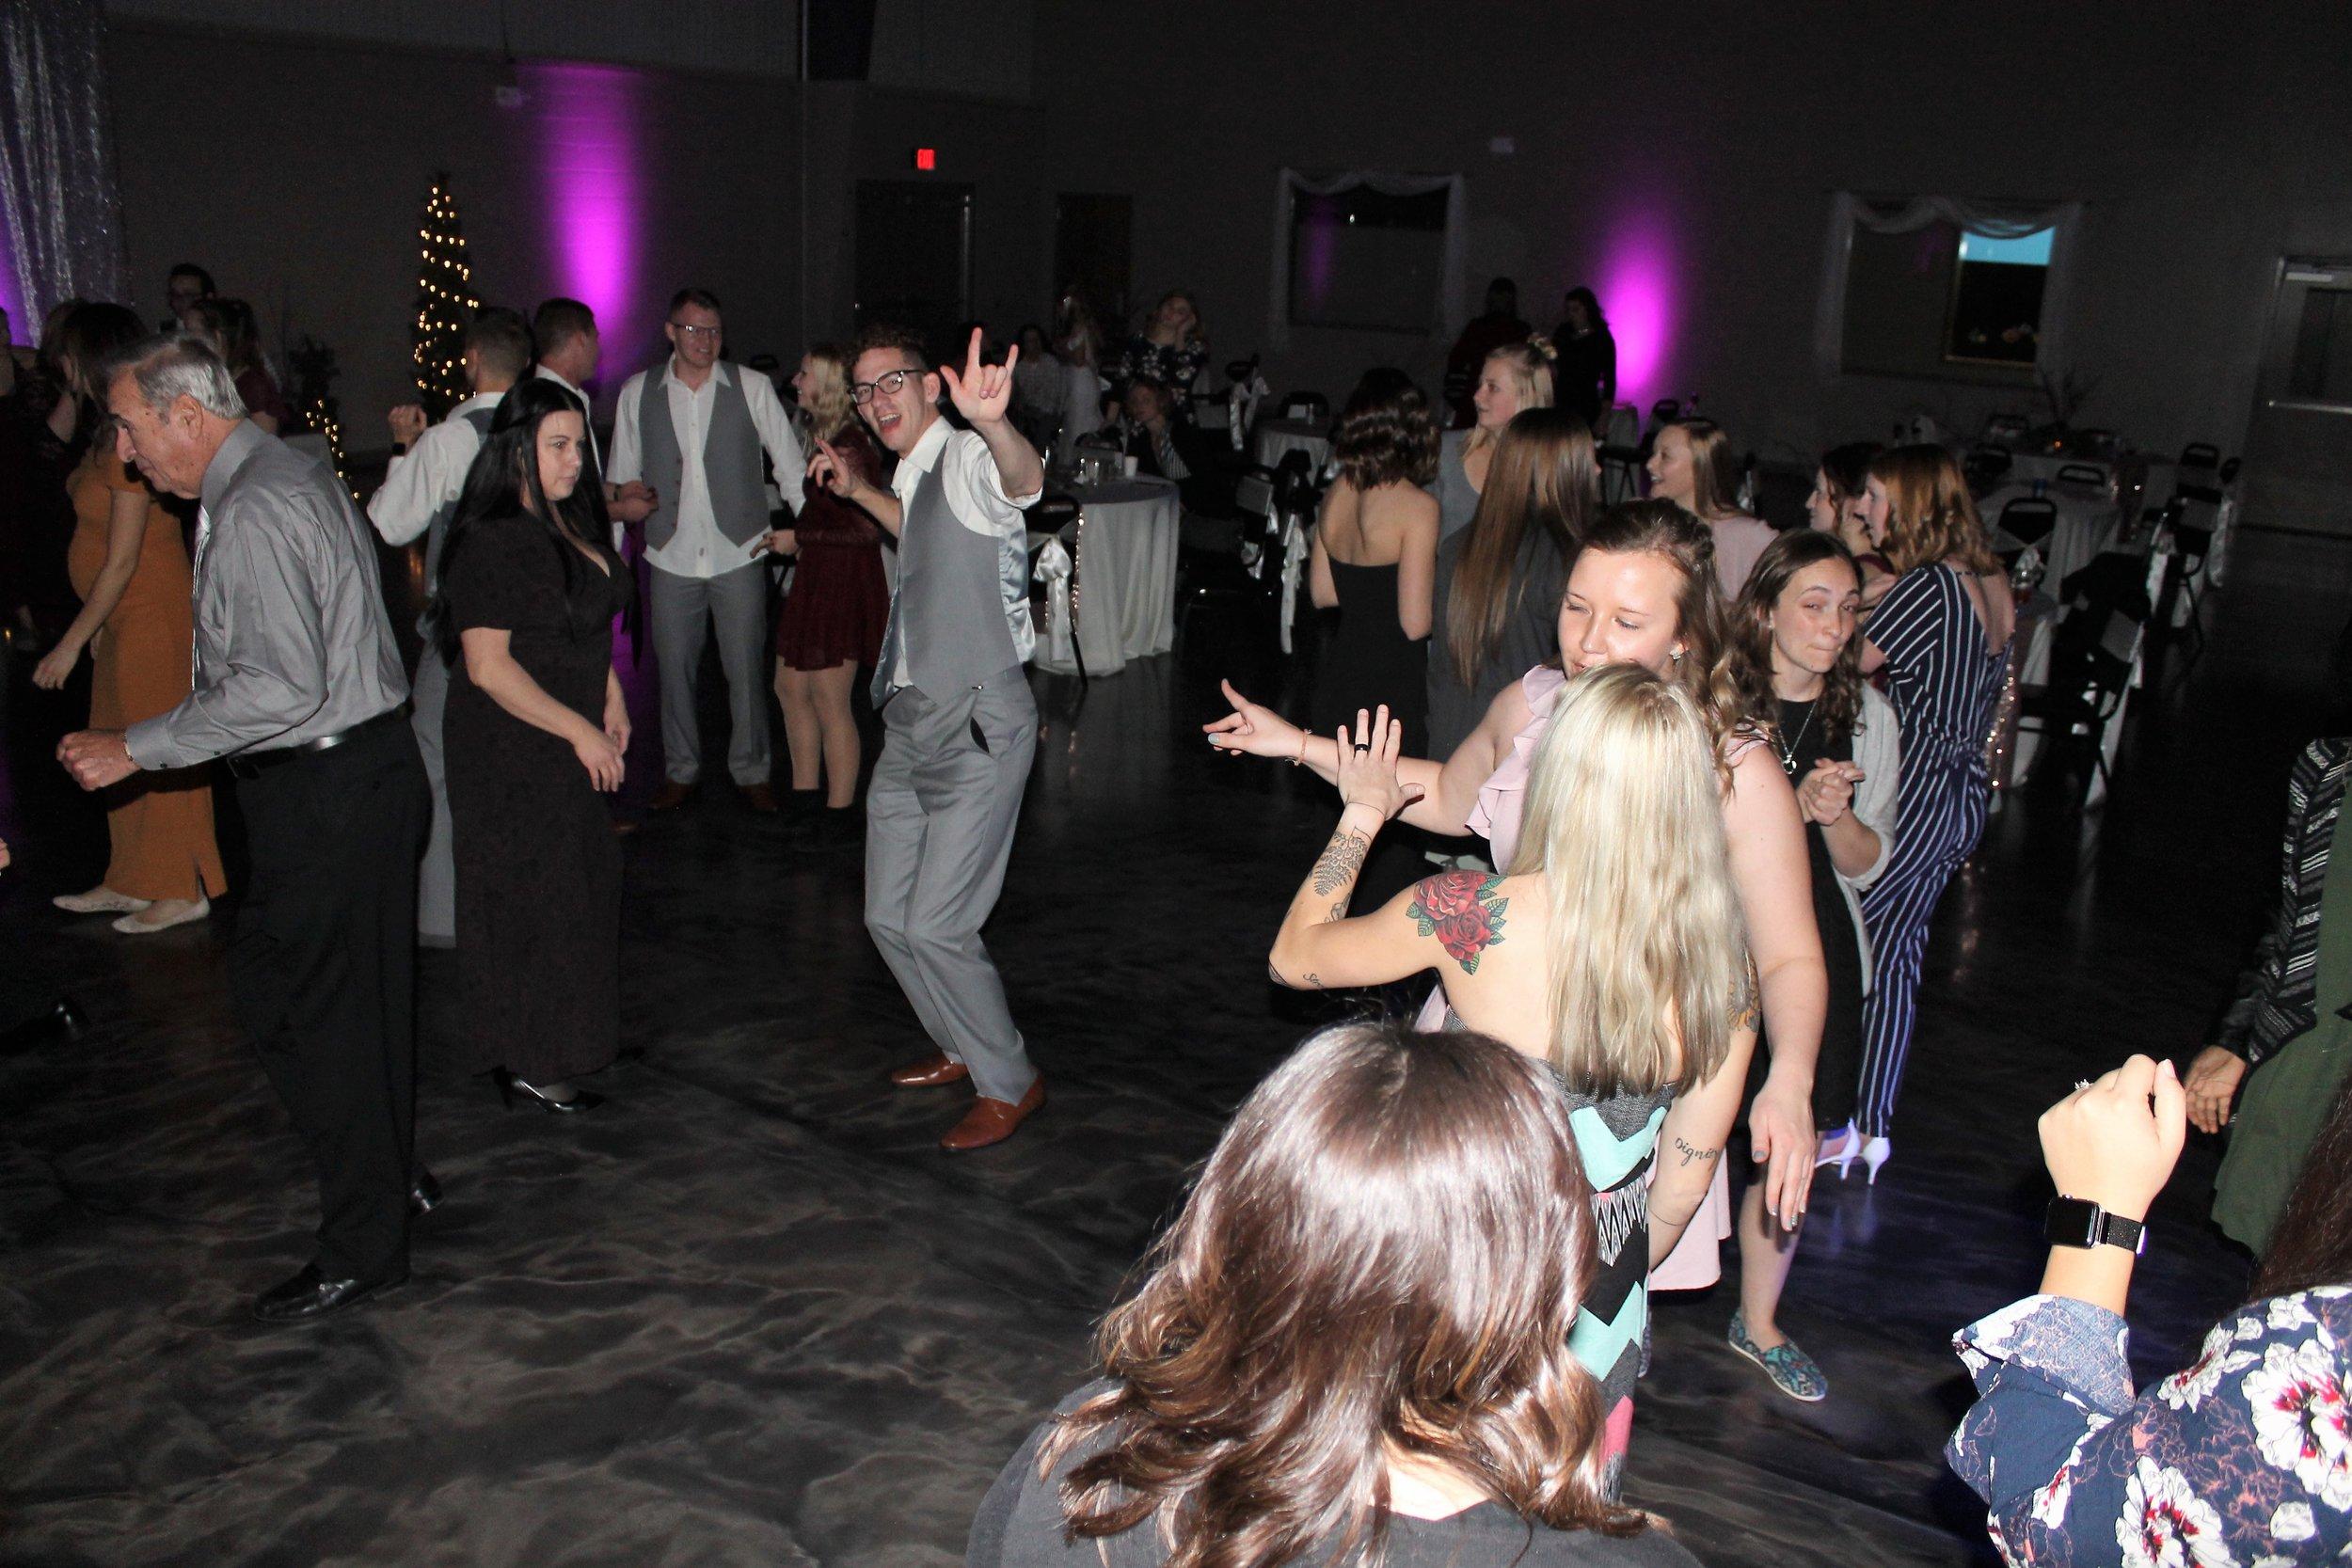 perkins dance.jpg